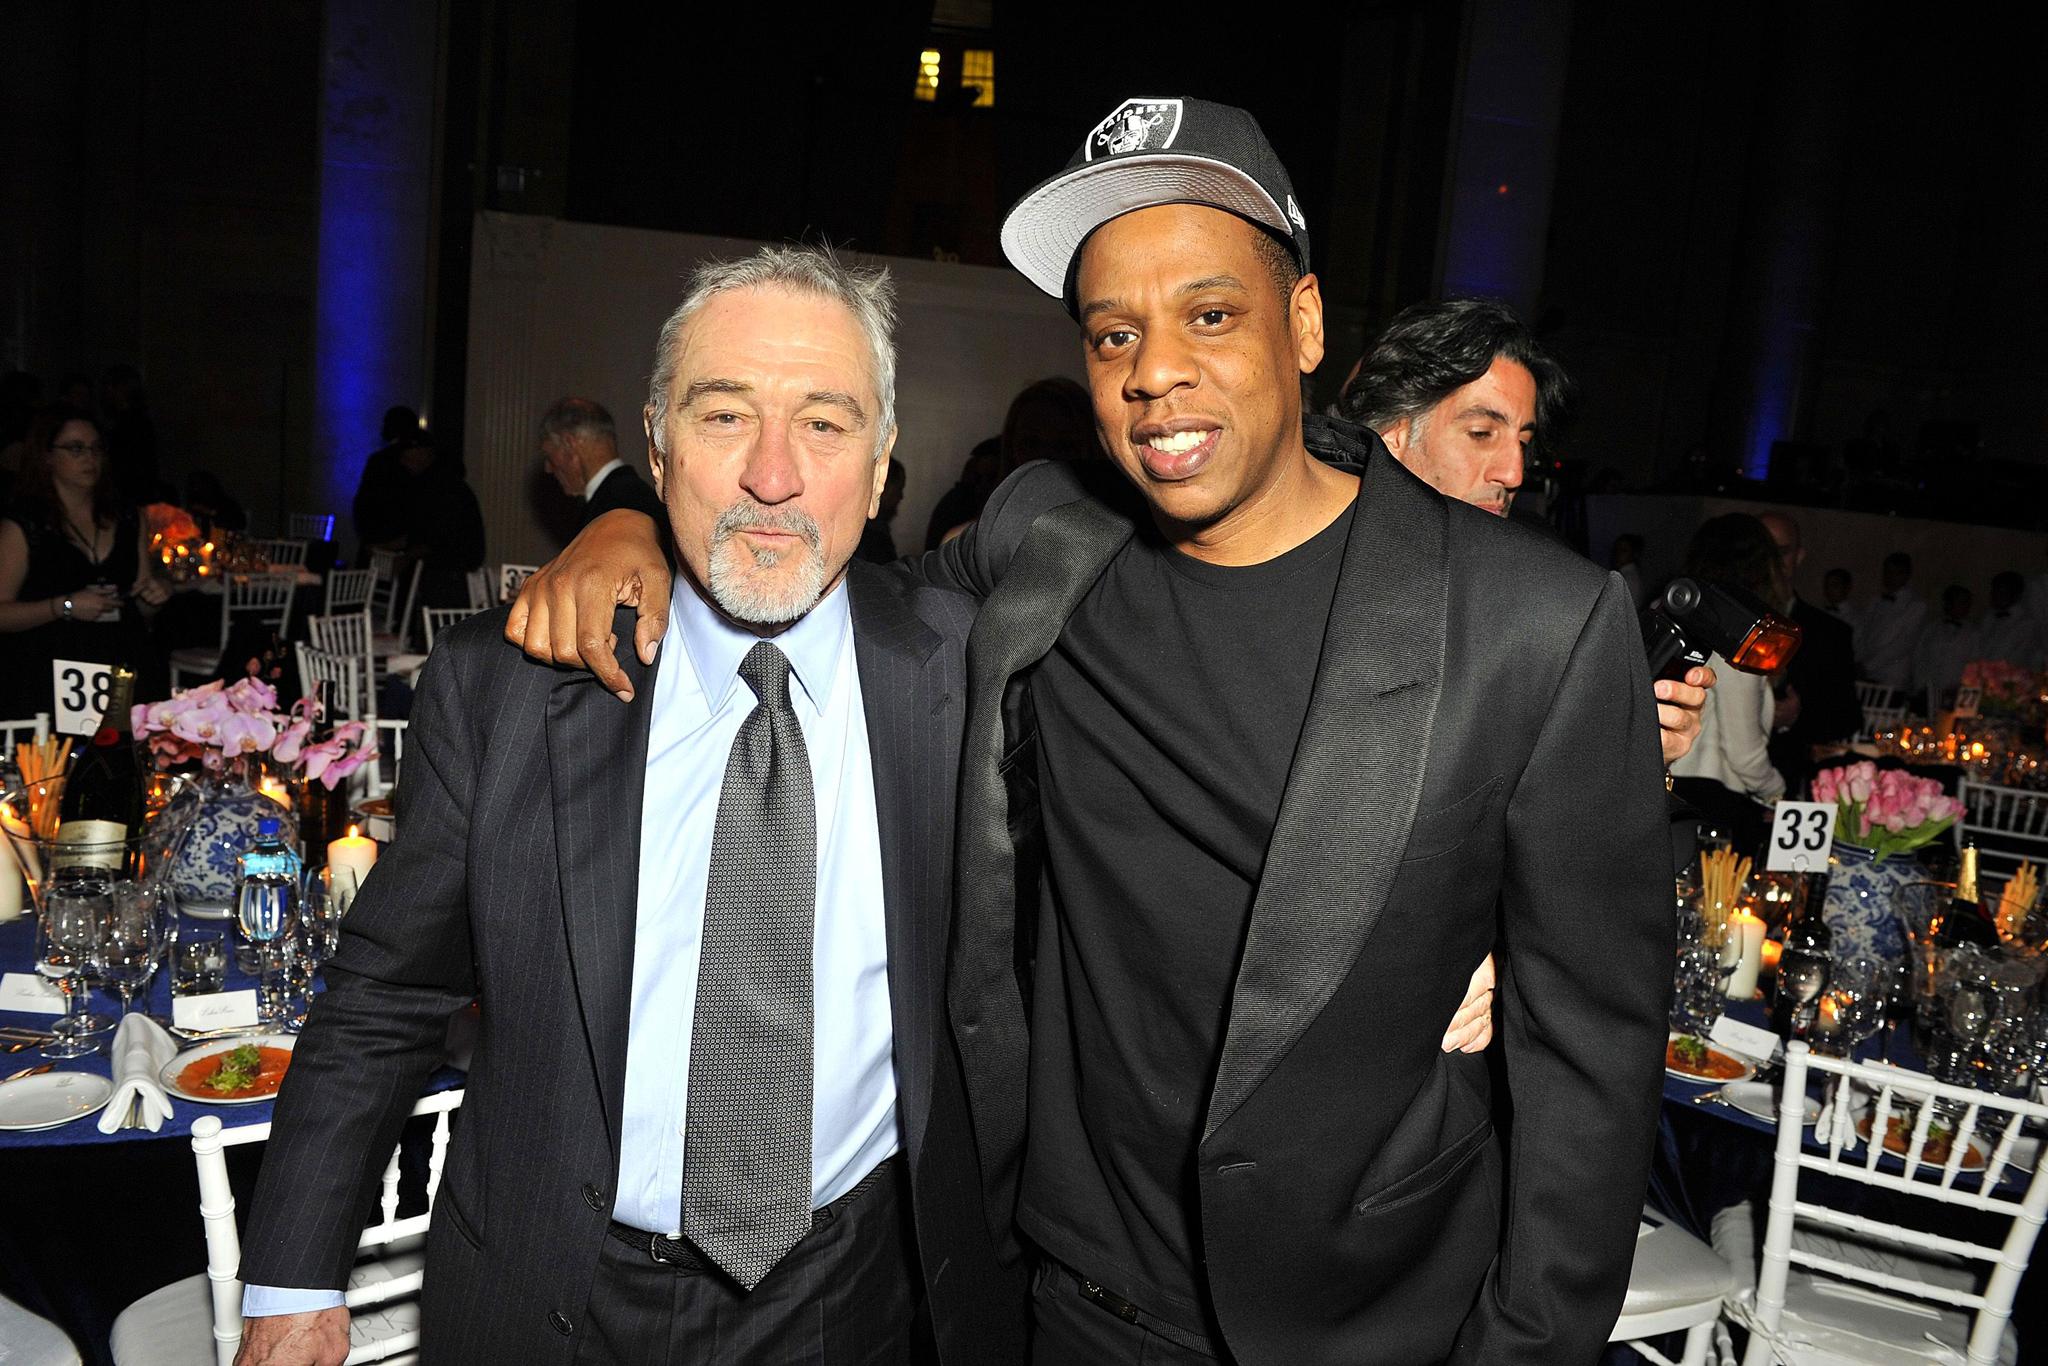 Robert De Niro and Jay Z amfAR gala, Inside, Cipriani Wall Street, New York, America - 10 Feb 2016